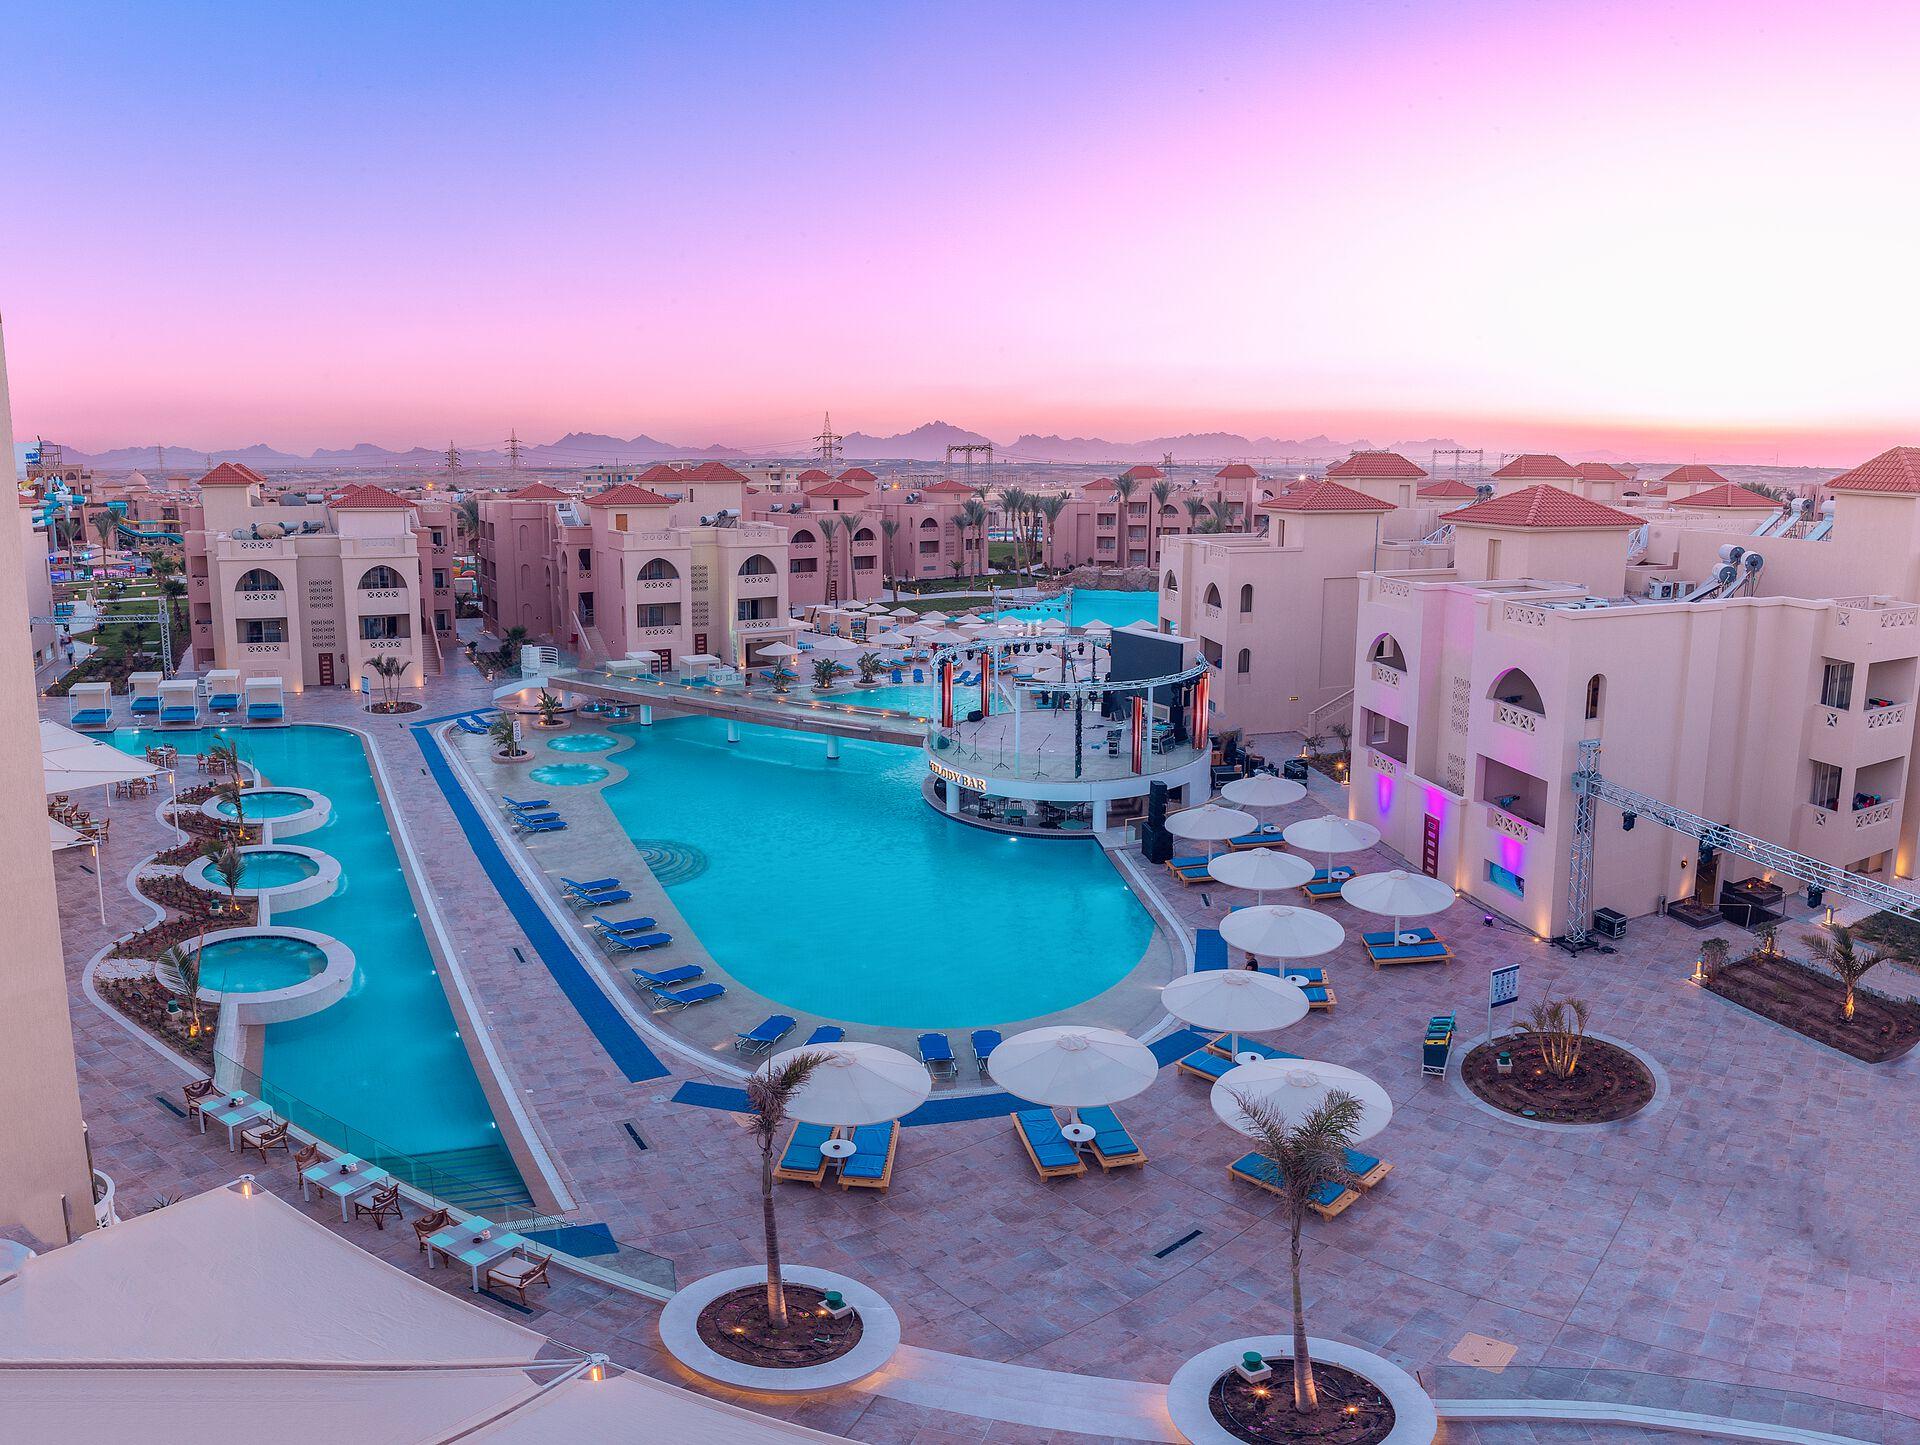 aqua blu resort - 4*